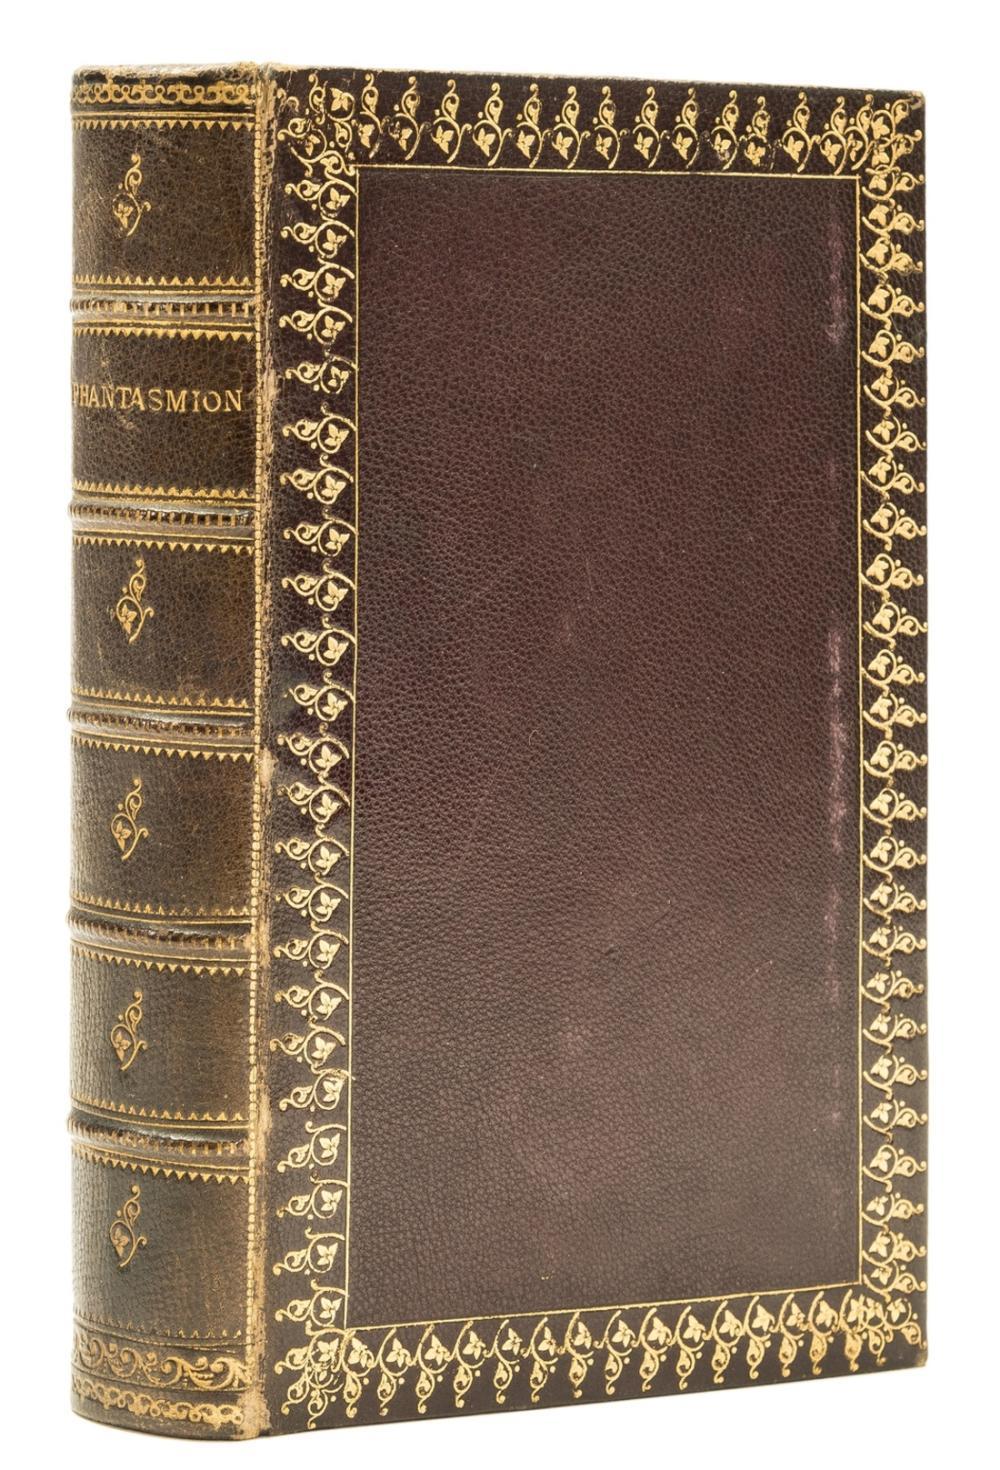 [Coleridge (Sara)] Phantasmion, first edition, contemporary burgundy morocco, gilt, William Pickering, 1837.